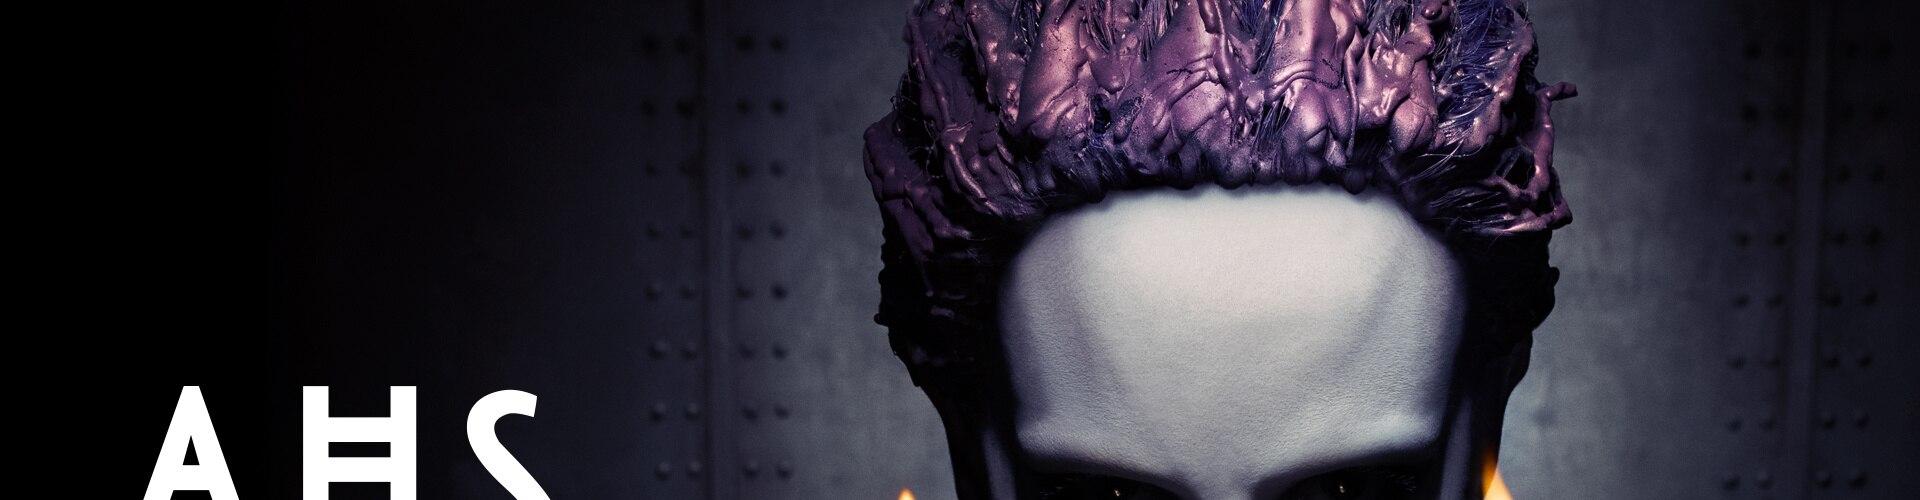 Watch American Horror Story: Apocalypse Online